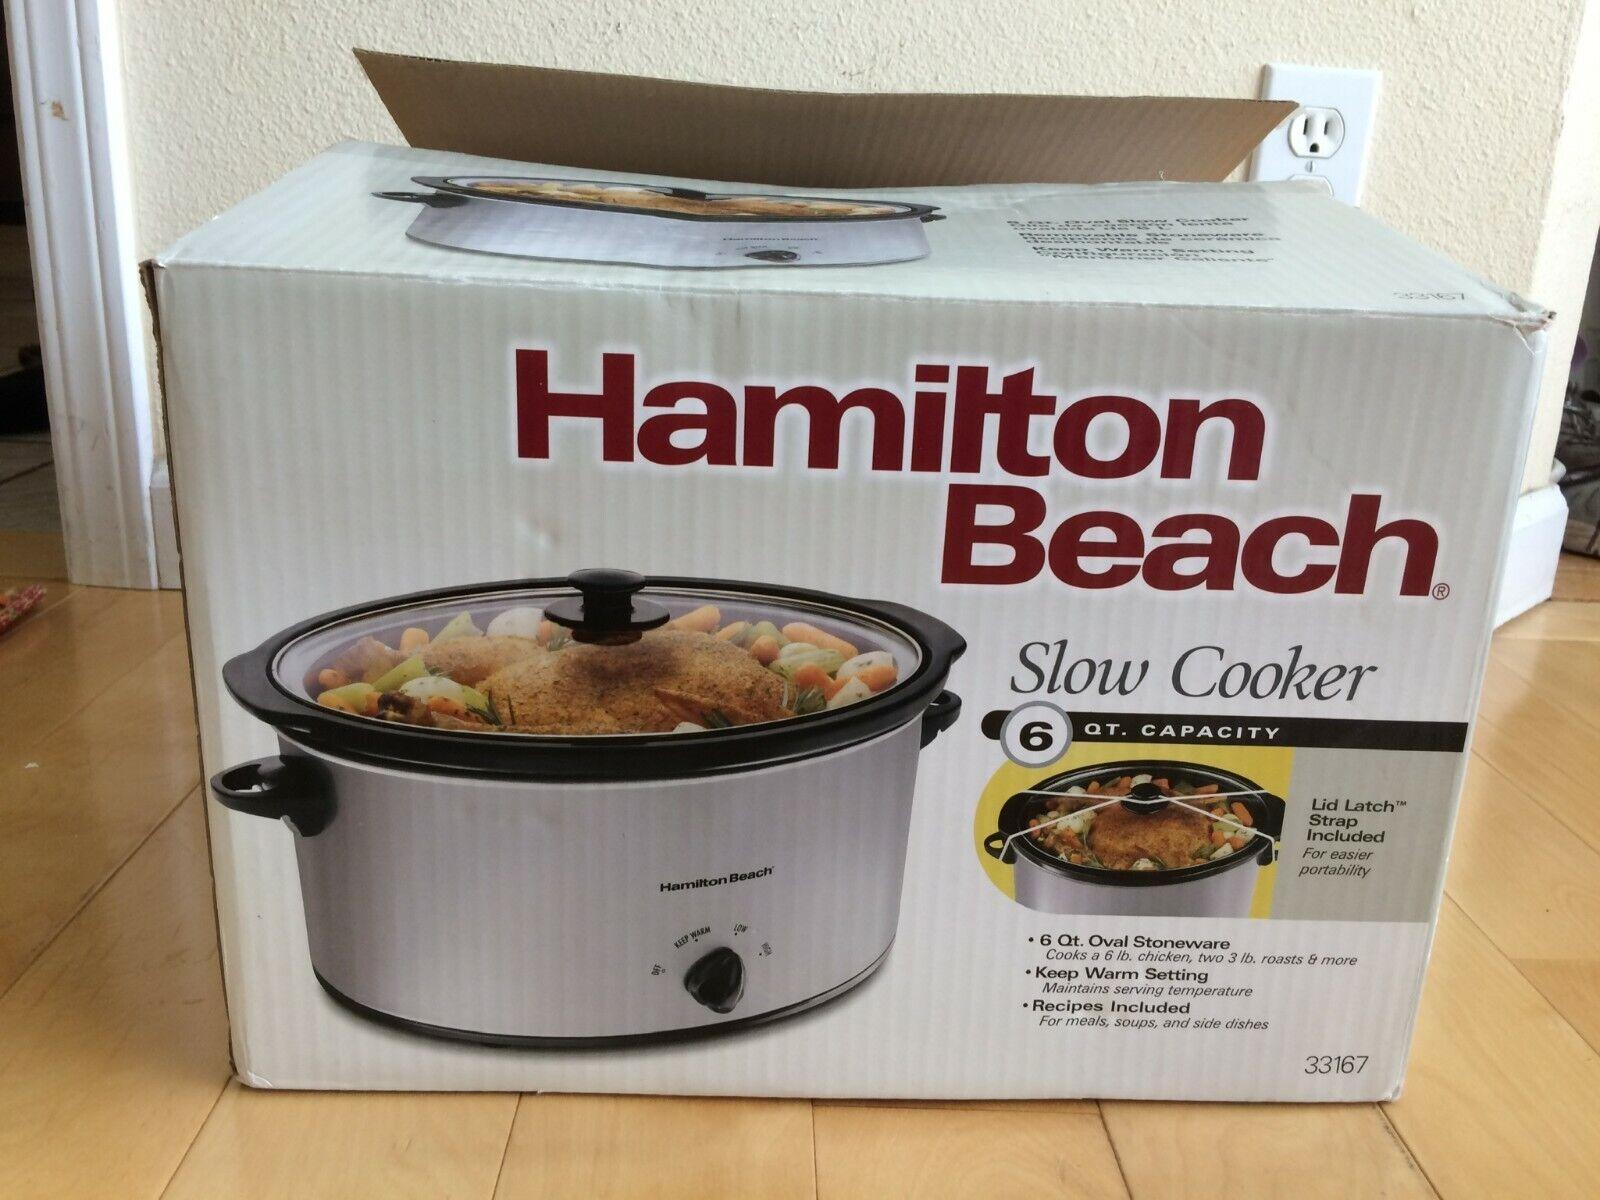 Slowcooker Hamilton Beach 33167 6-qt